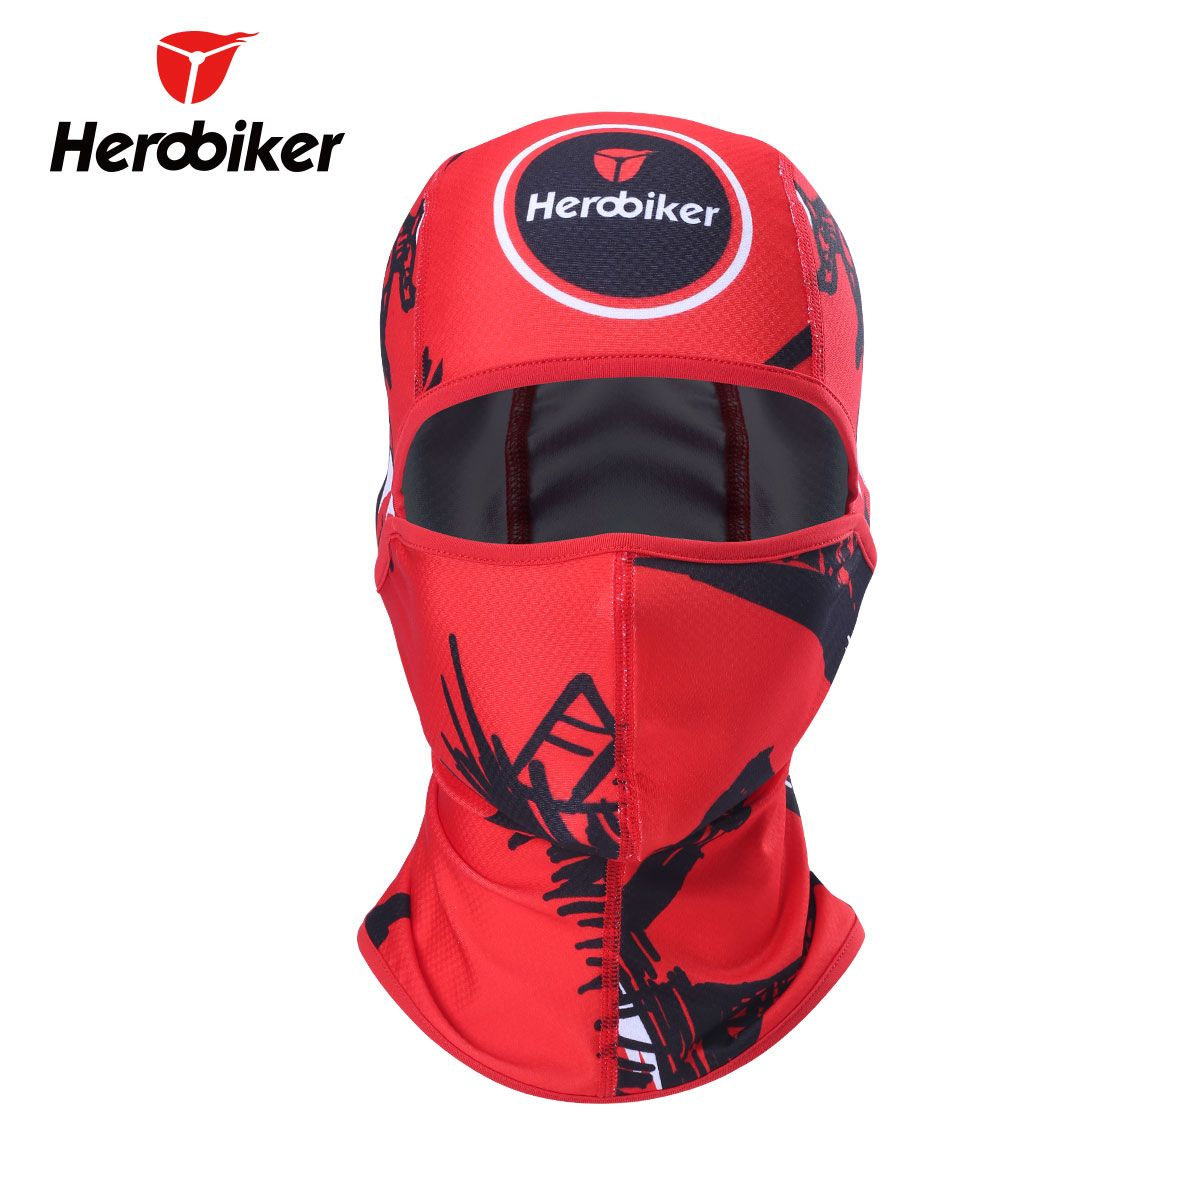 HEROBIKER Motorcycle Balaclava Face Mask Sun-protection Moto Balaclava Tactical Face Mask Headscarf Headgear